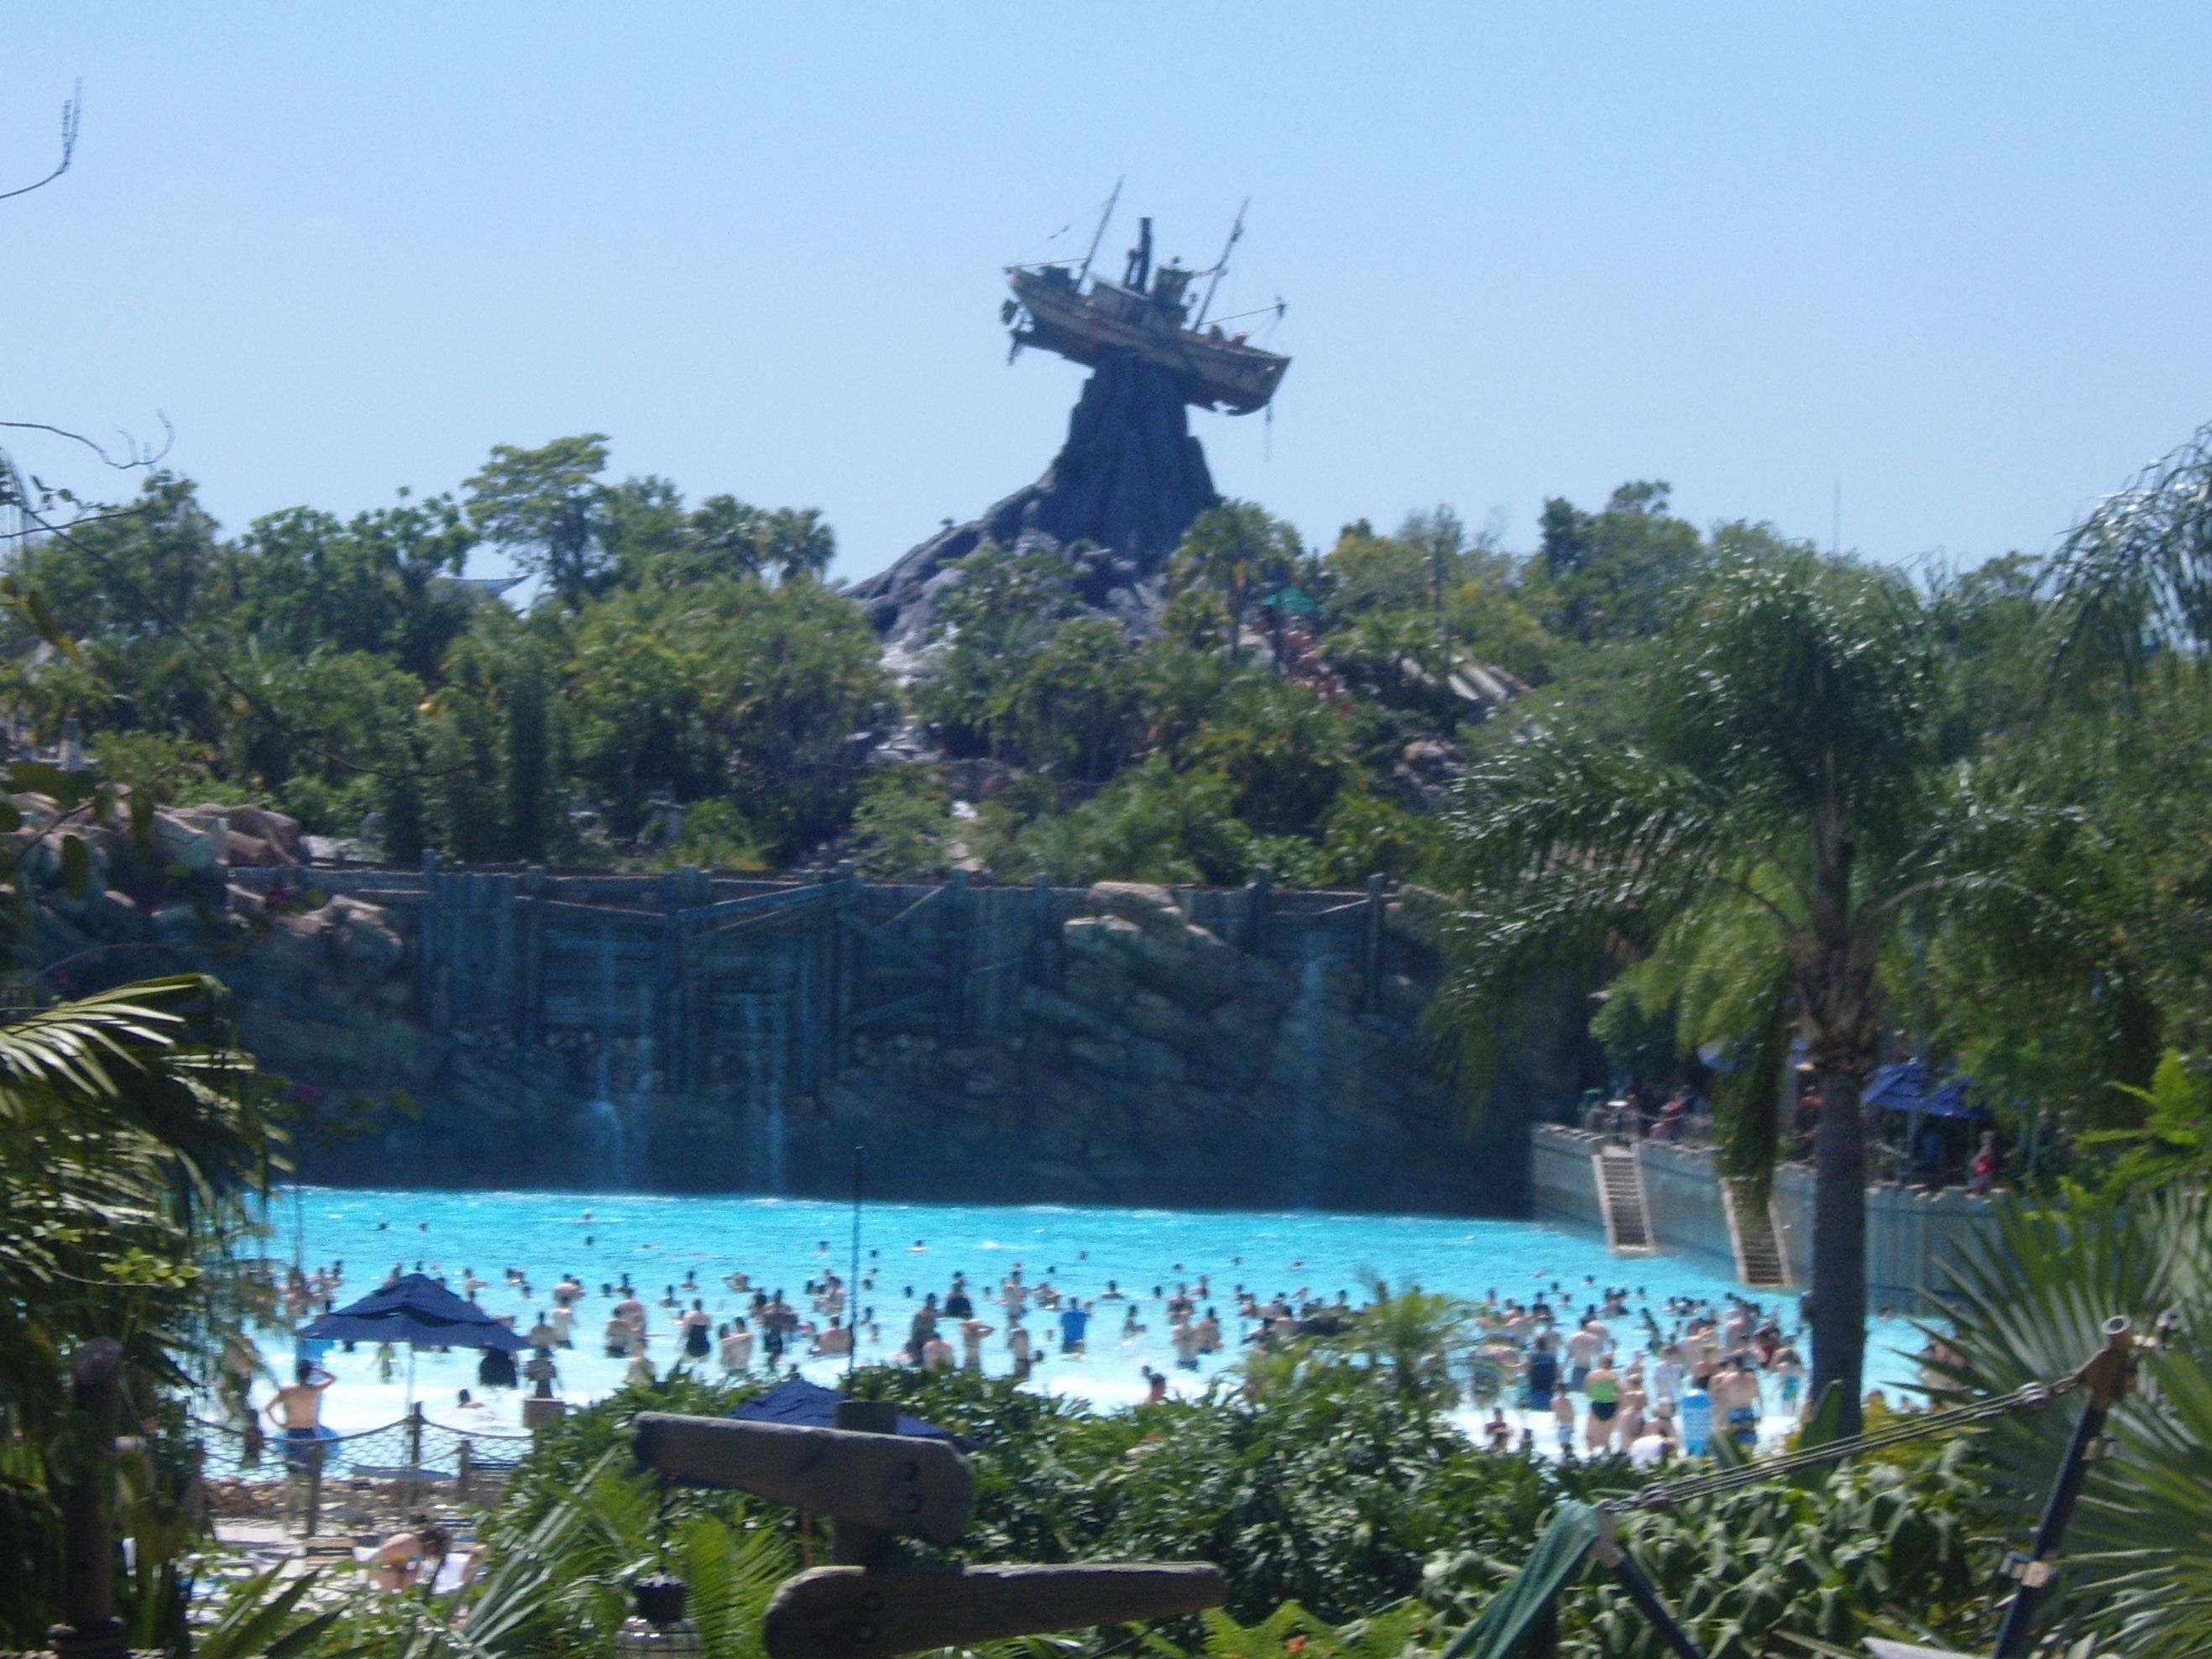 Water park - Wikipedia